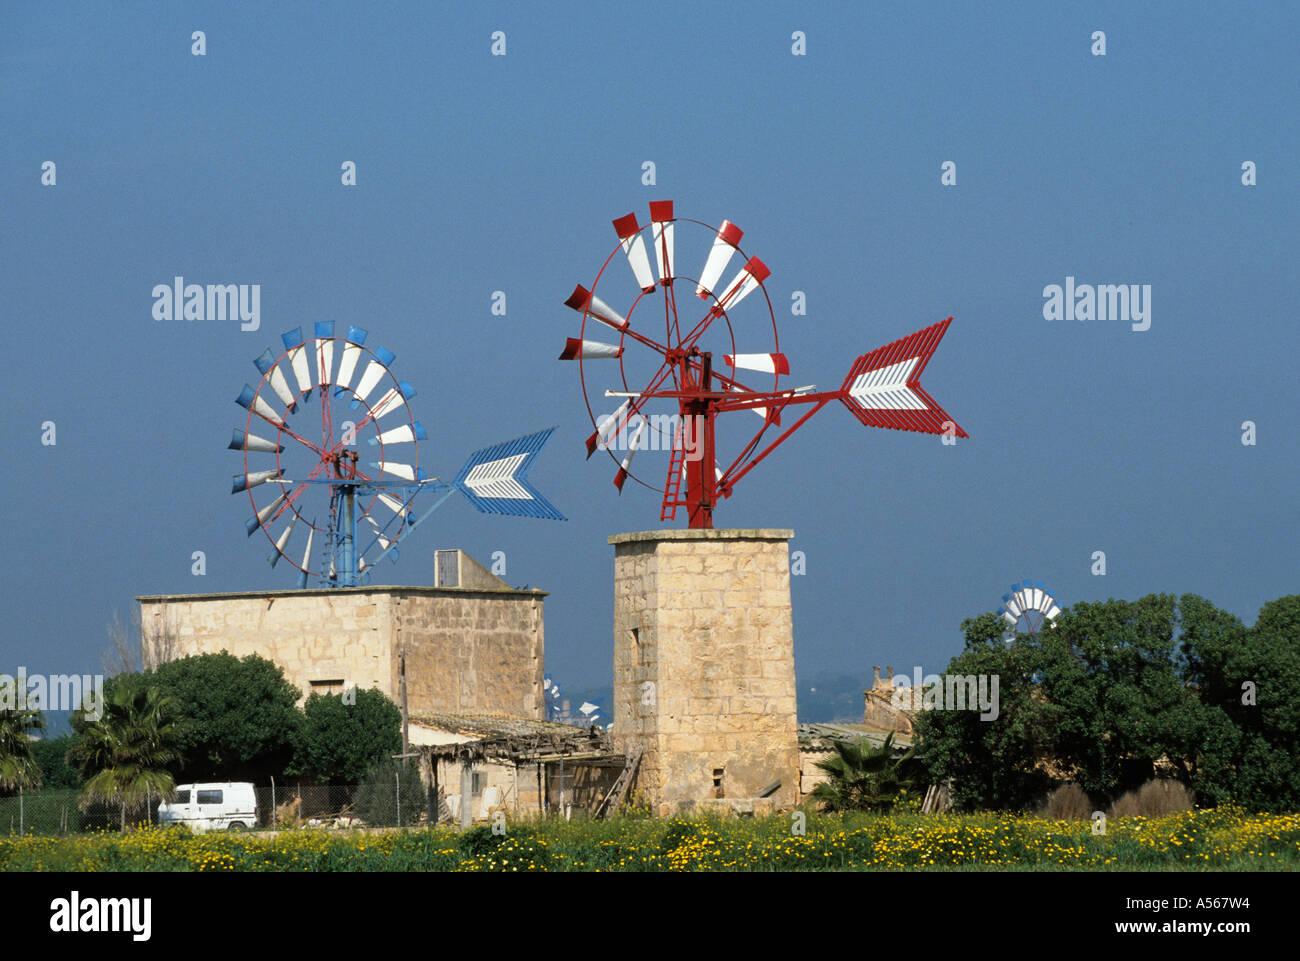 Mallorca Sant Jordi windmills - Stock Image